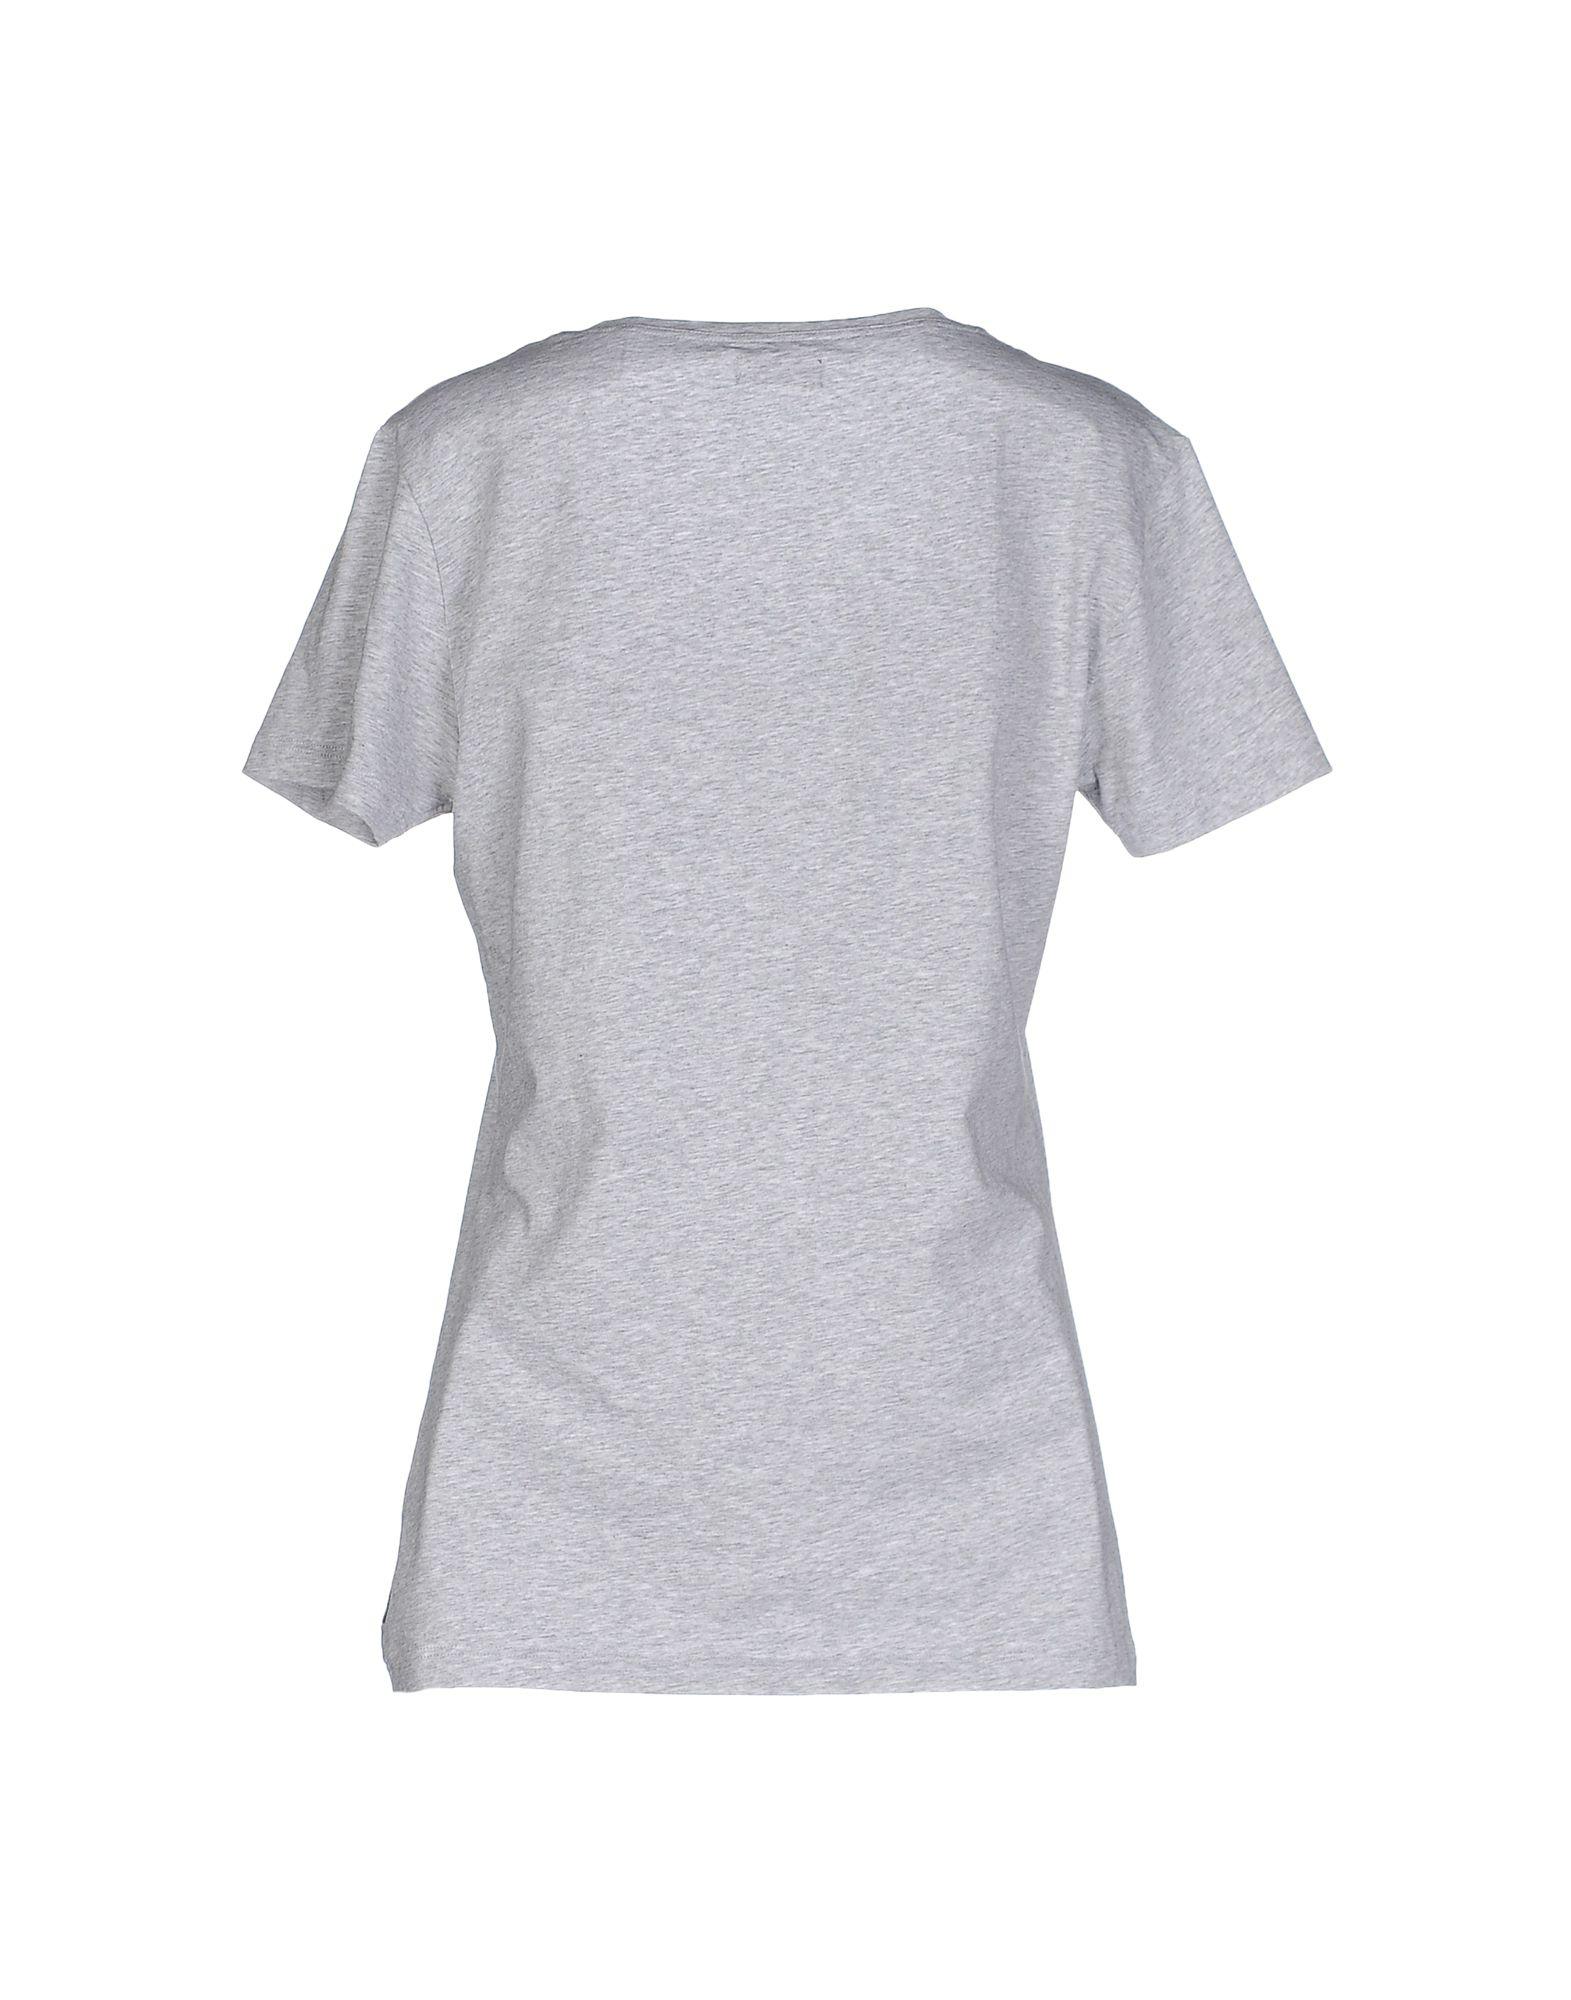 24ca6515902bb Emporio Armani Undershirt in Gray - Lyst